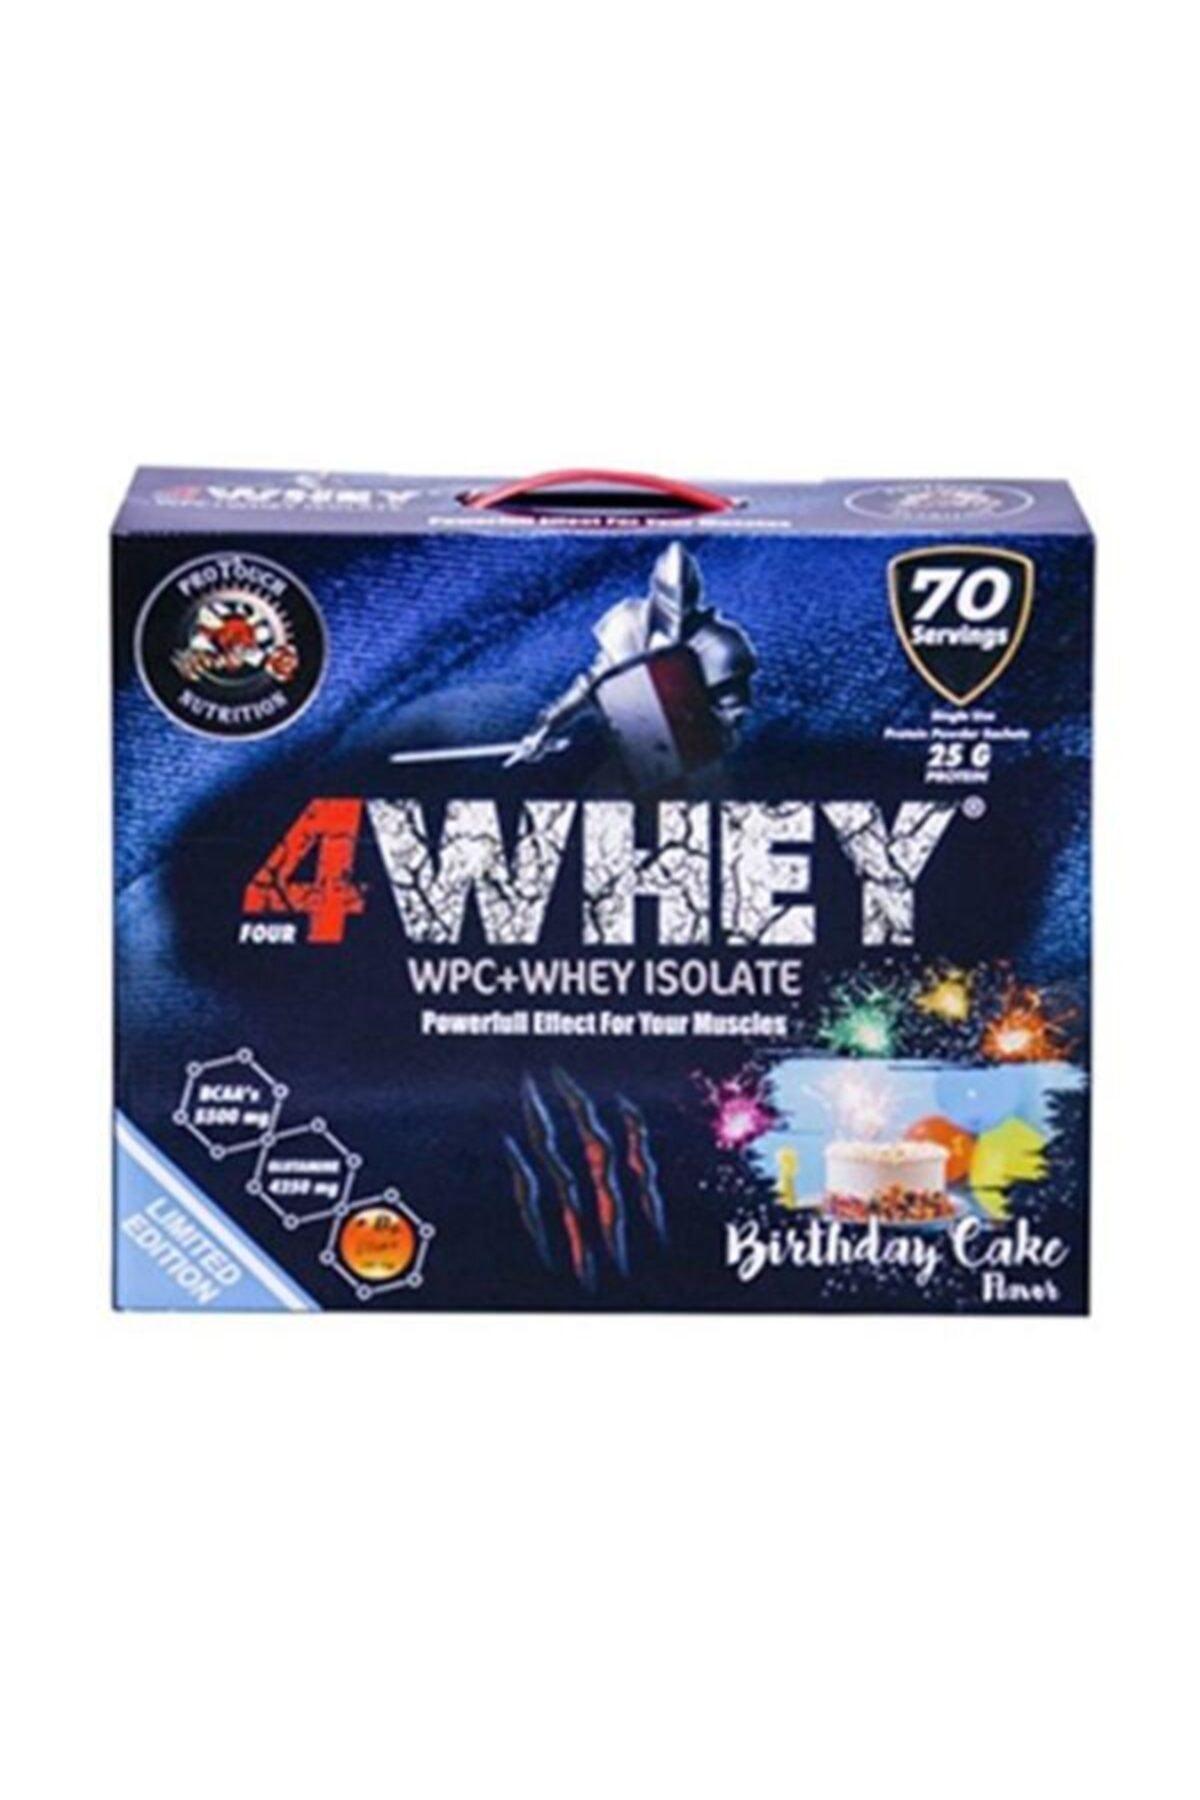 Protouch Nutrition Doğum Günü Pasta Aromalı 4whey Limited Edition 2450 gr 1